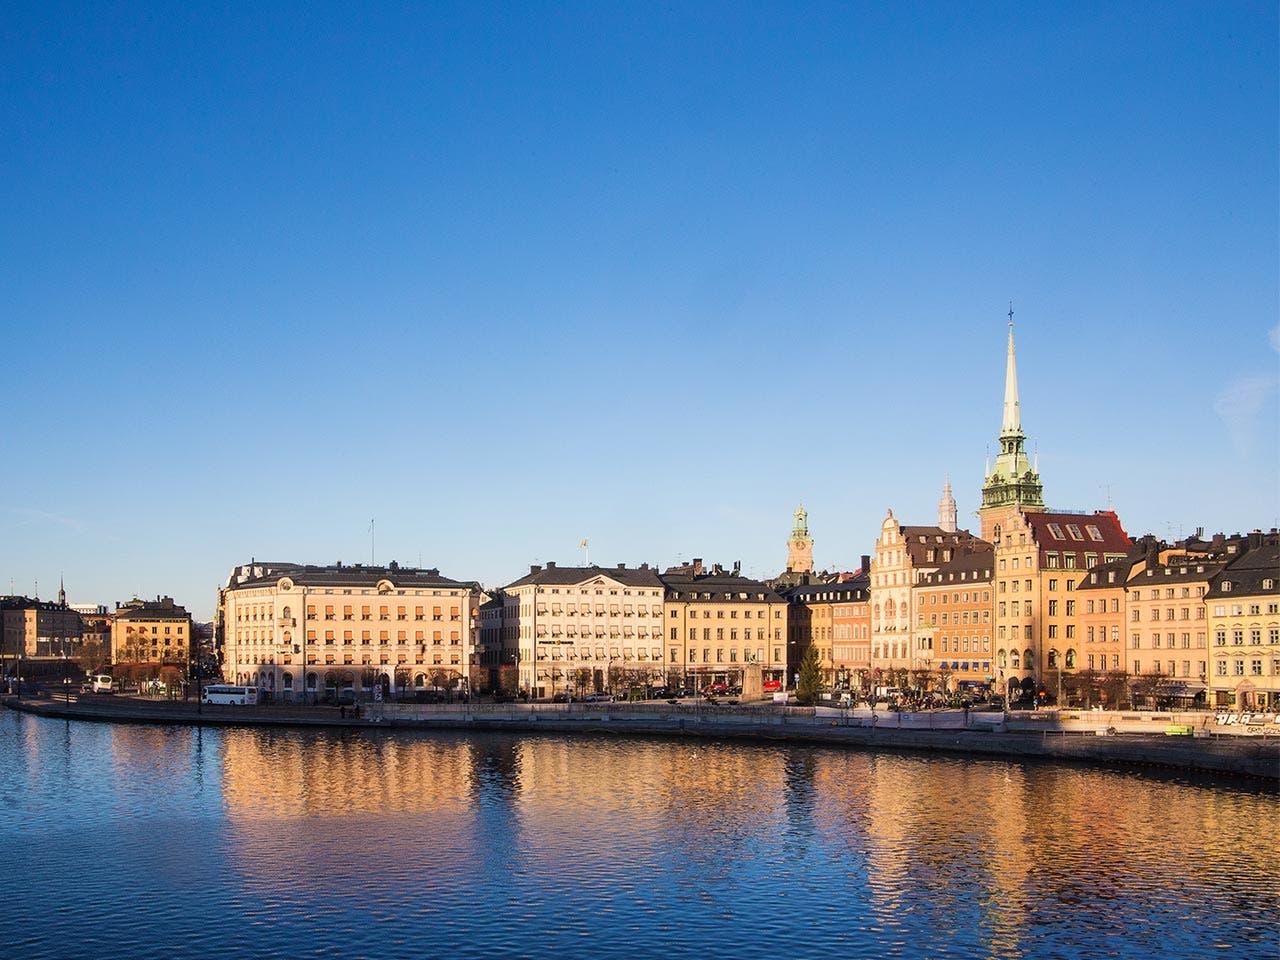 Sweden | Katerina Krasikova/Shutterstock.com